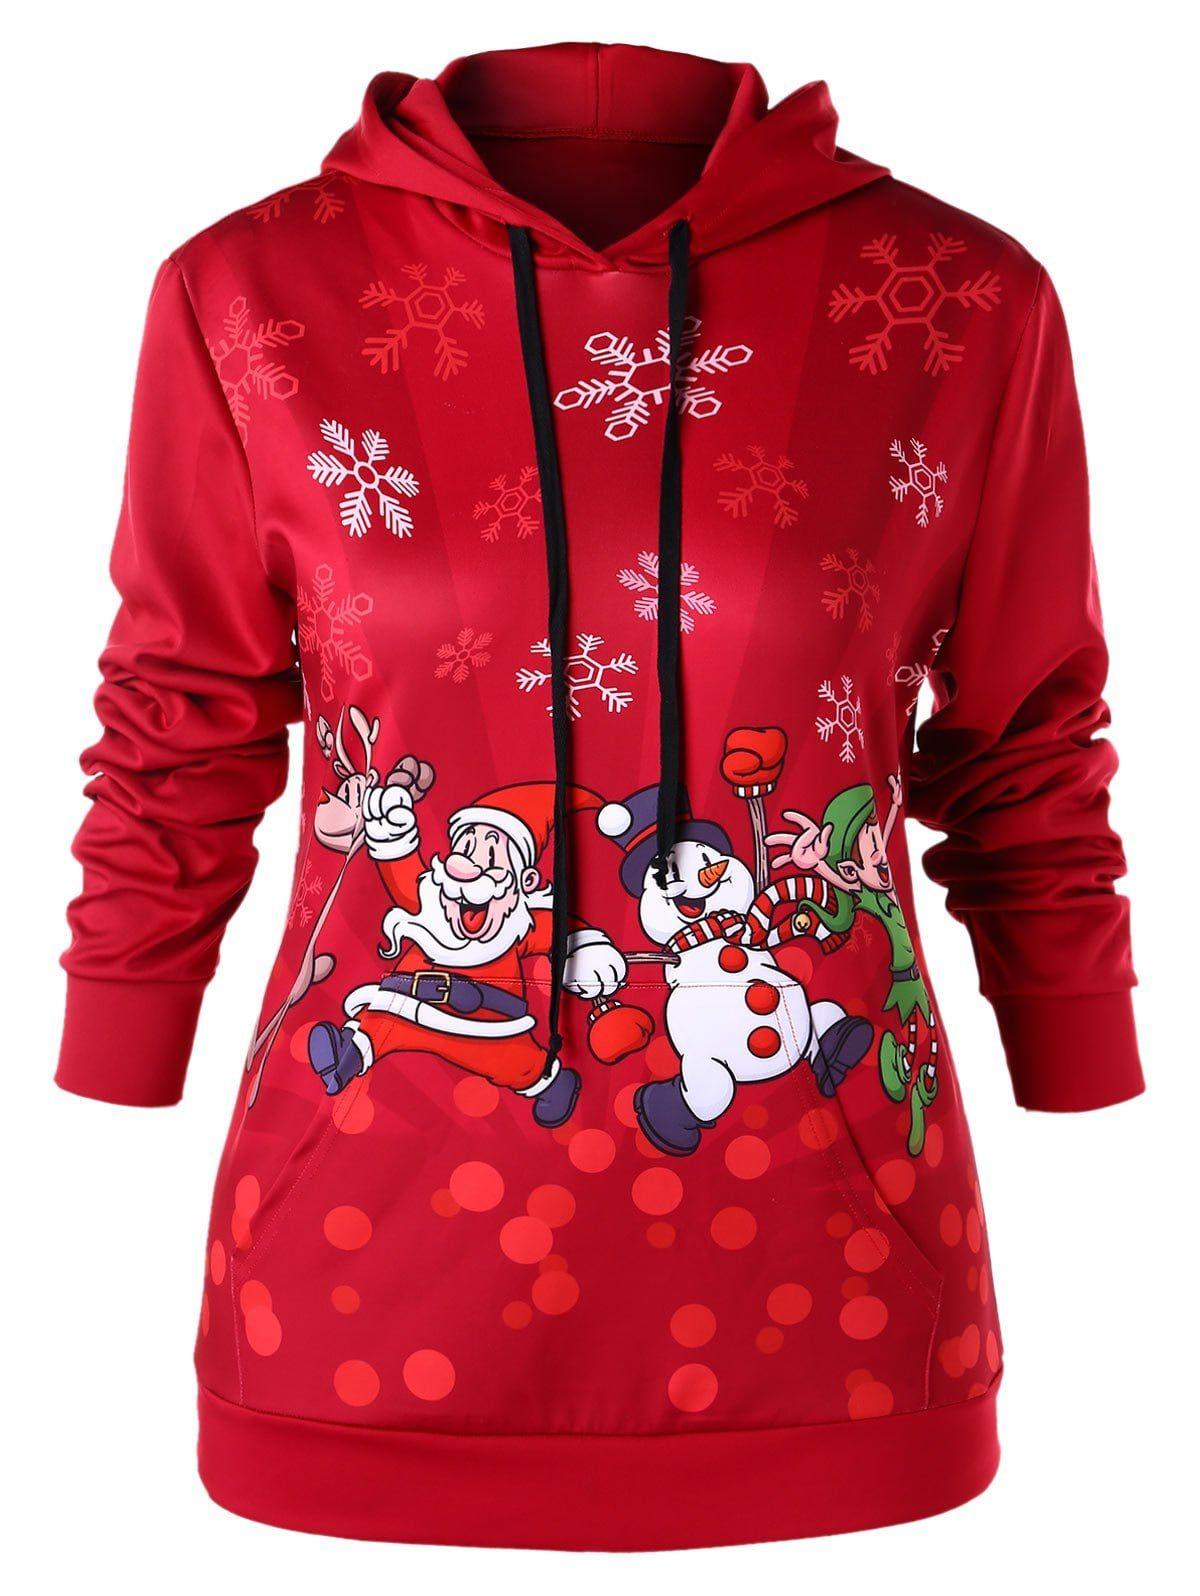 Plus Size Kangaroo Pocket Christmas Snowflake Santa Claus Hoodie